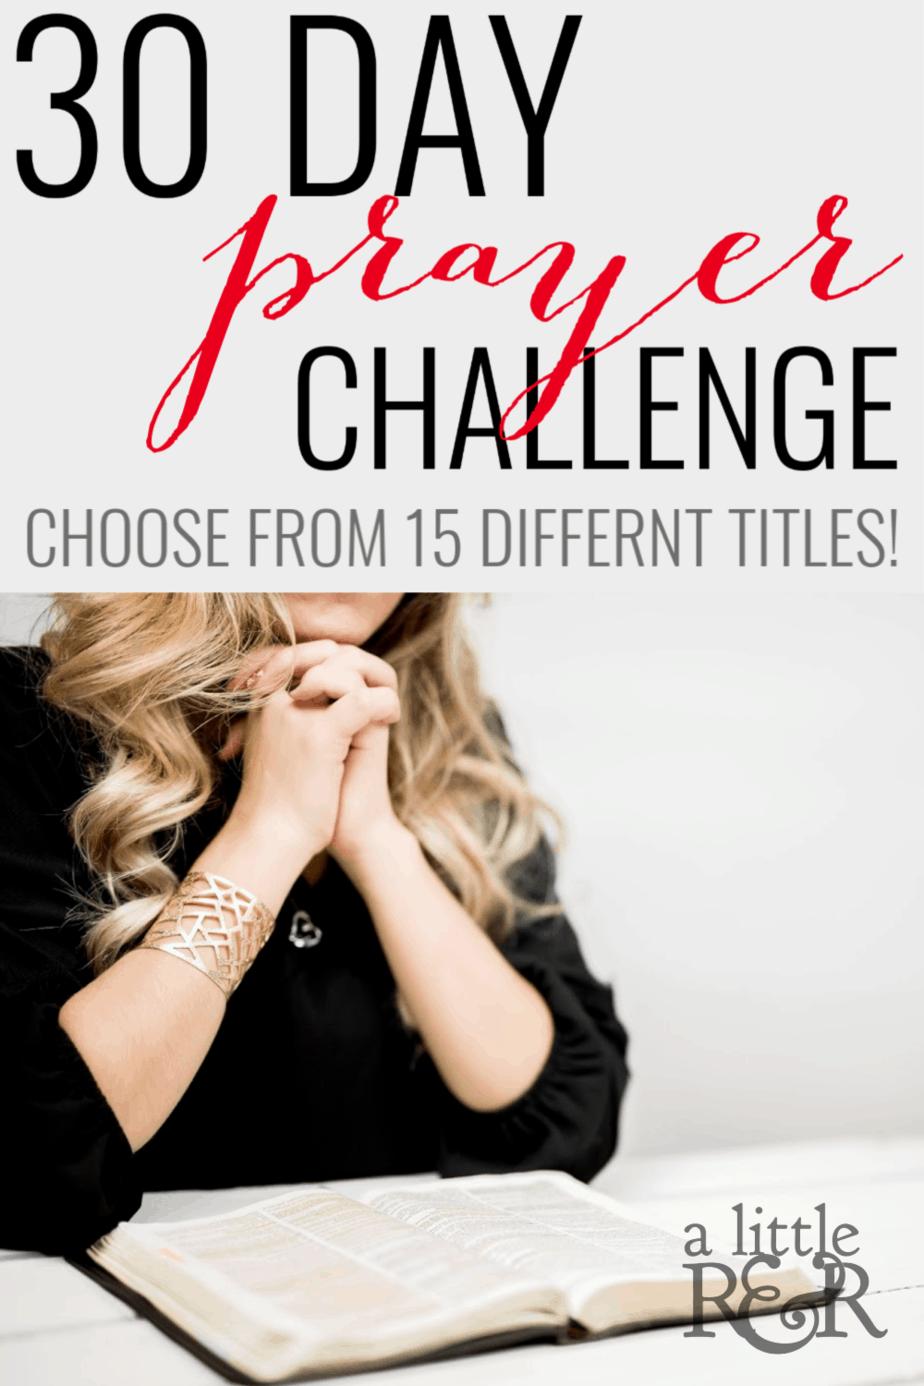 Choose from 15 different titles to help develop your prayer life and war room by praying through God's Word daily. #alittlerandr #prayer #warroom #prayerchallenge via @alittlerandr